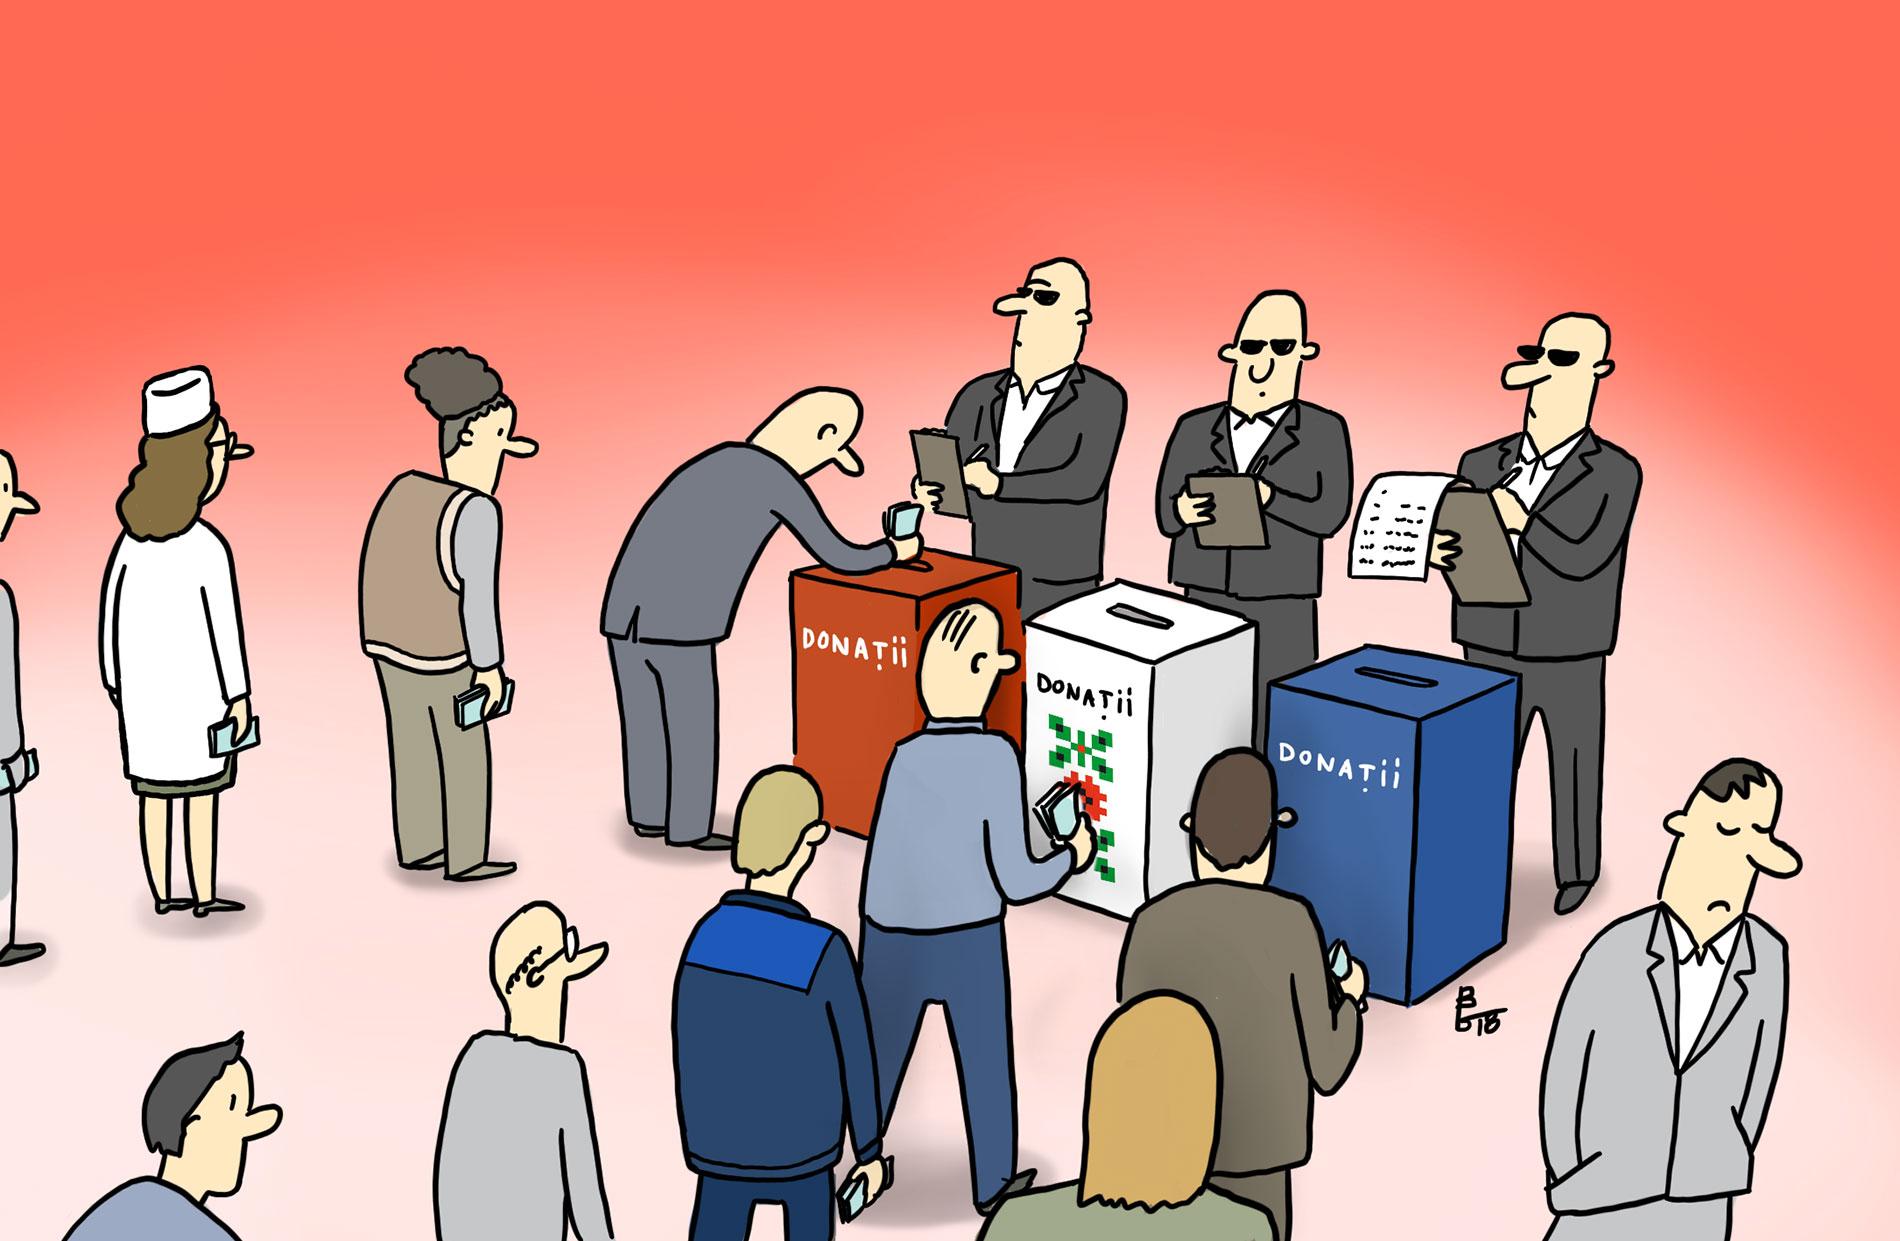 donatii-caricatura-2